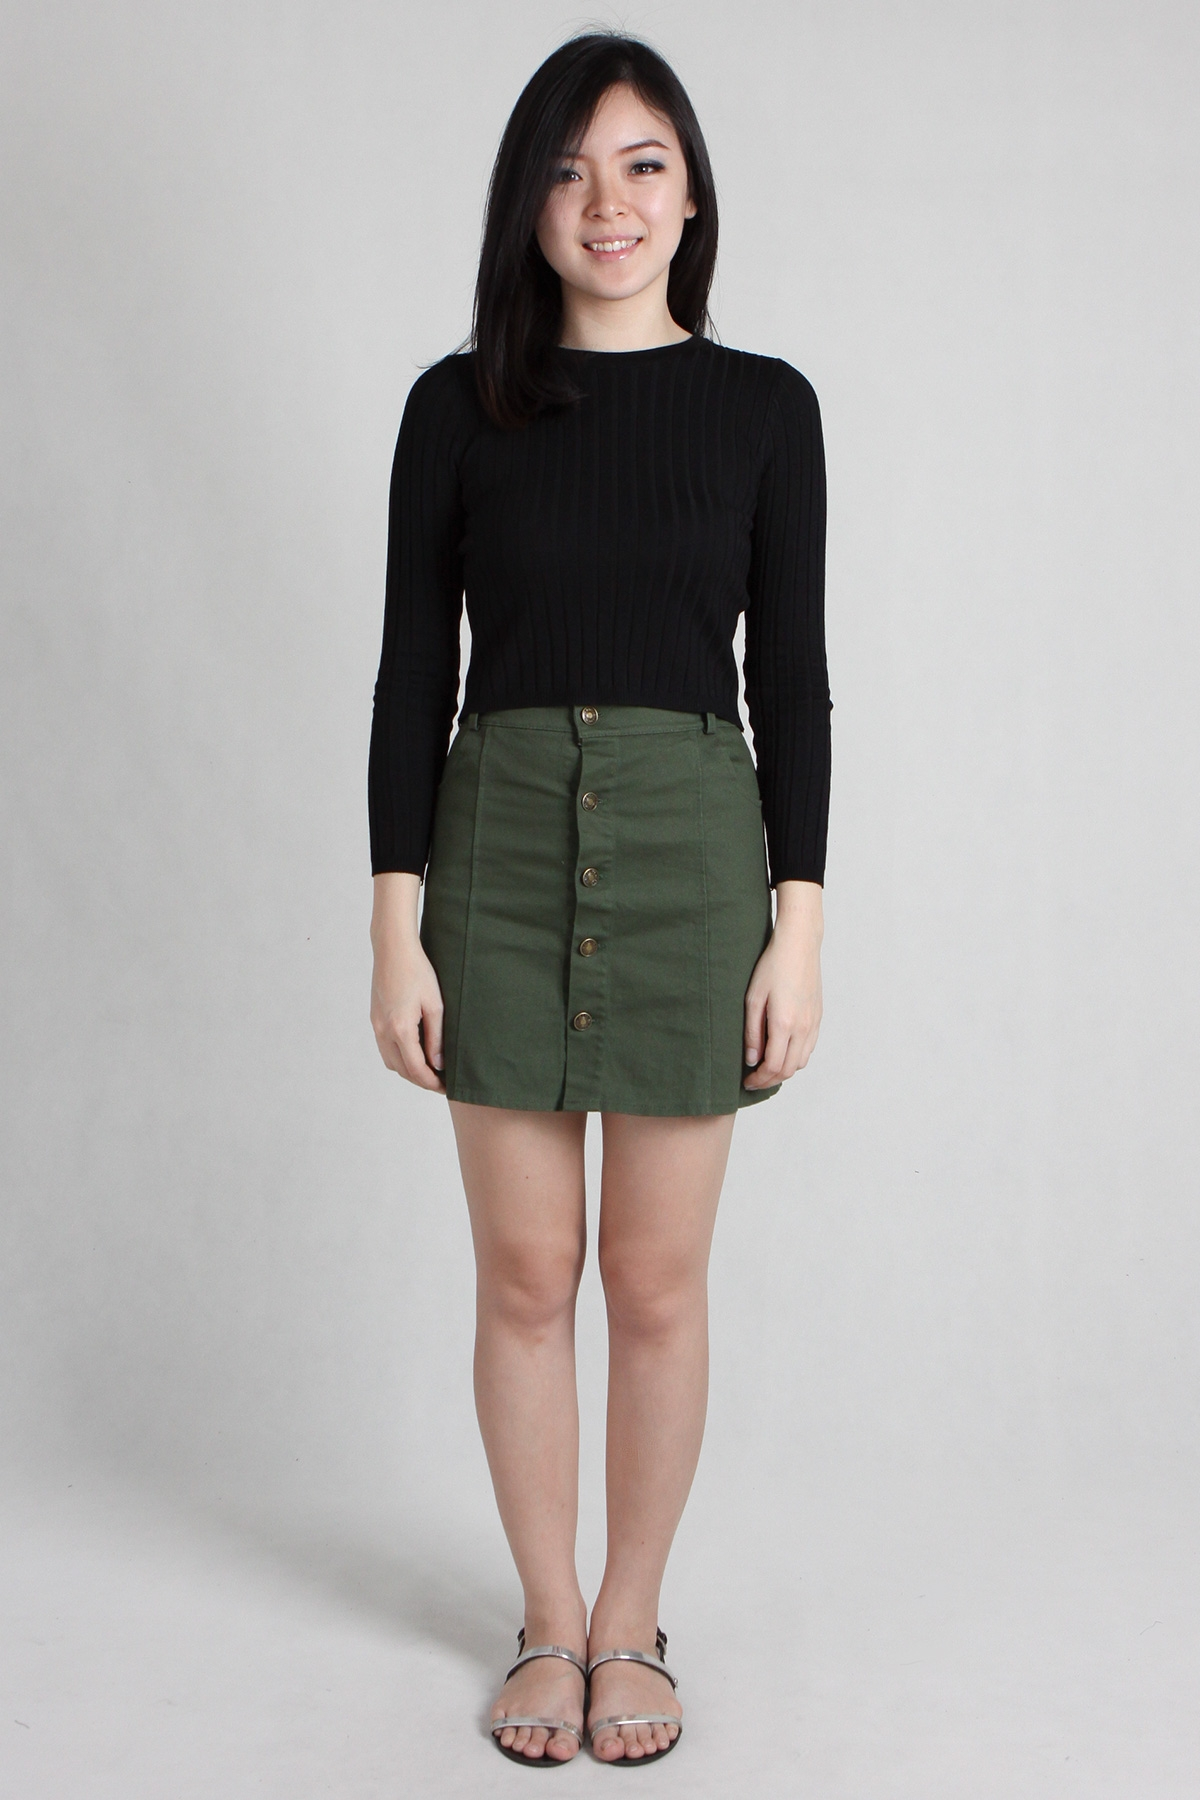 Sweater Dress Cowl Neck